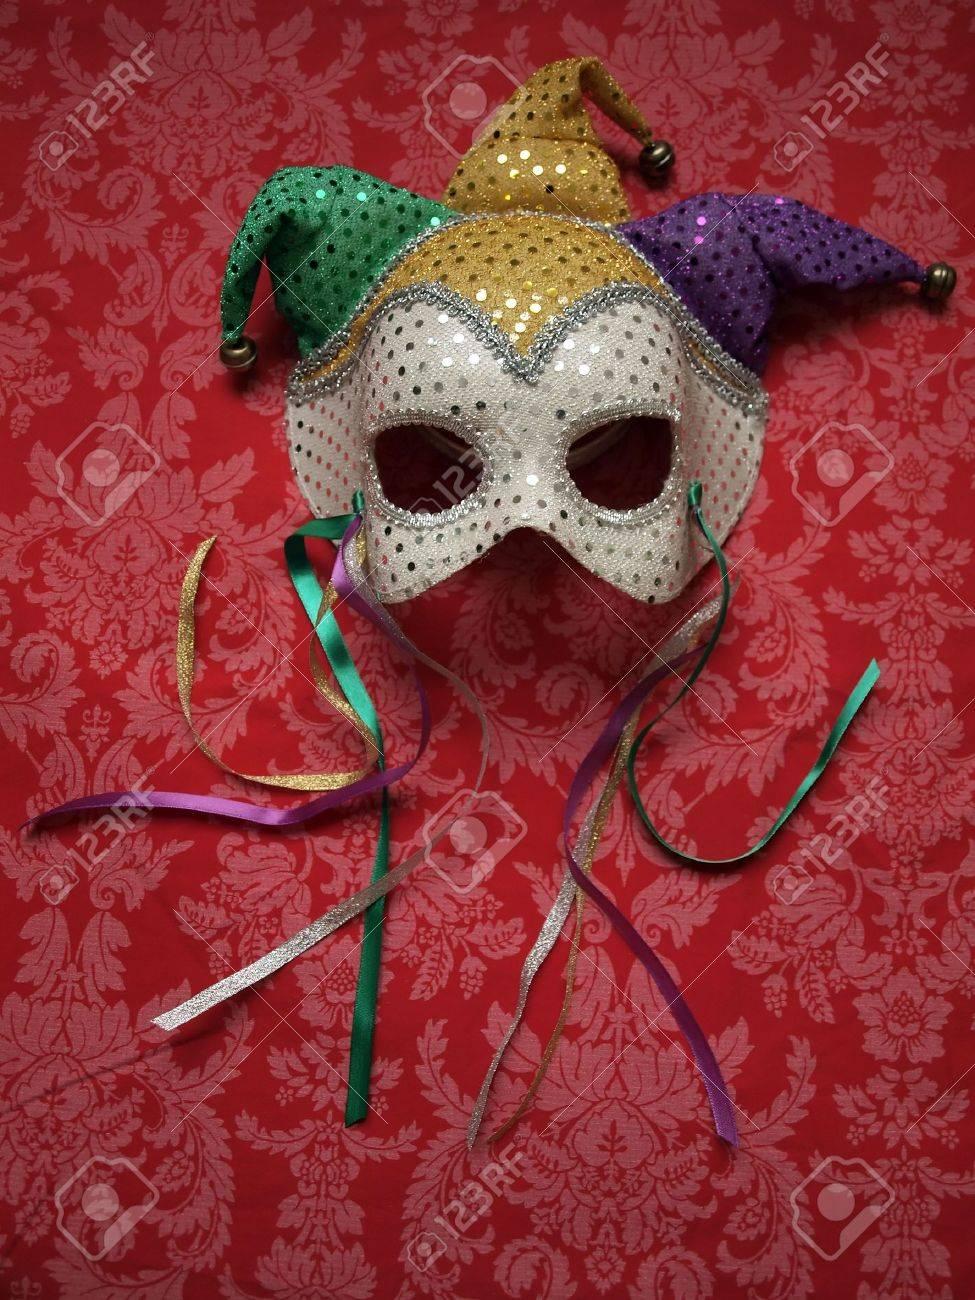 carnival mask on decorative fabric Stock Photo - 6242211